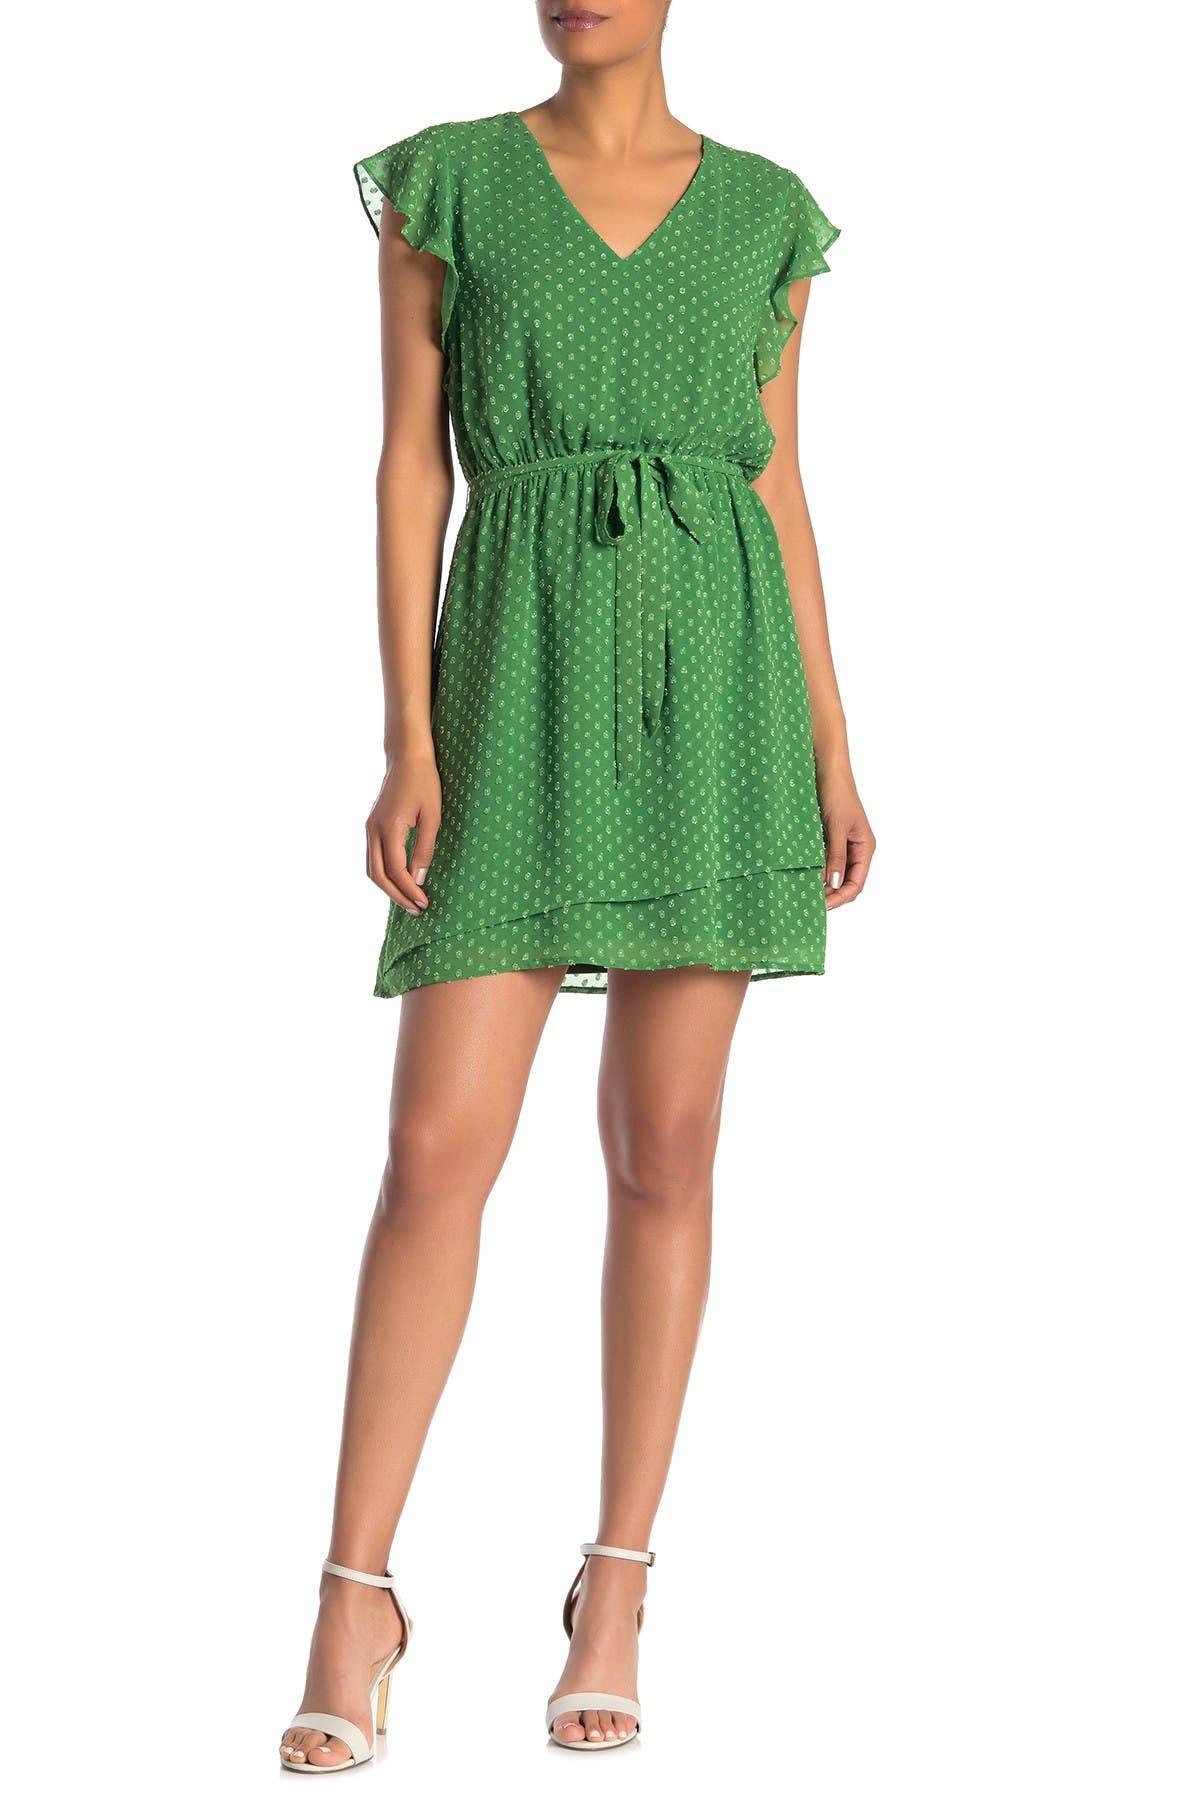 Image of DR2 by Daniel Rainn Flutter Sleeve Micro Clip Dot Belted Dress